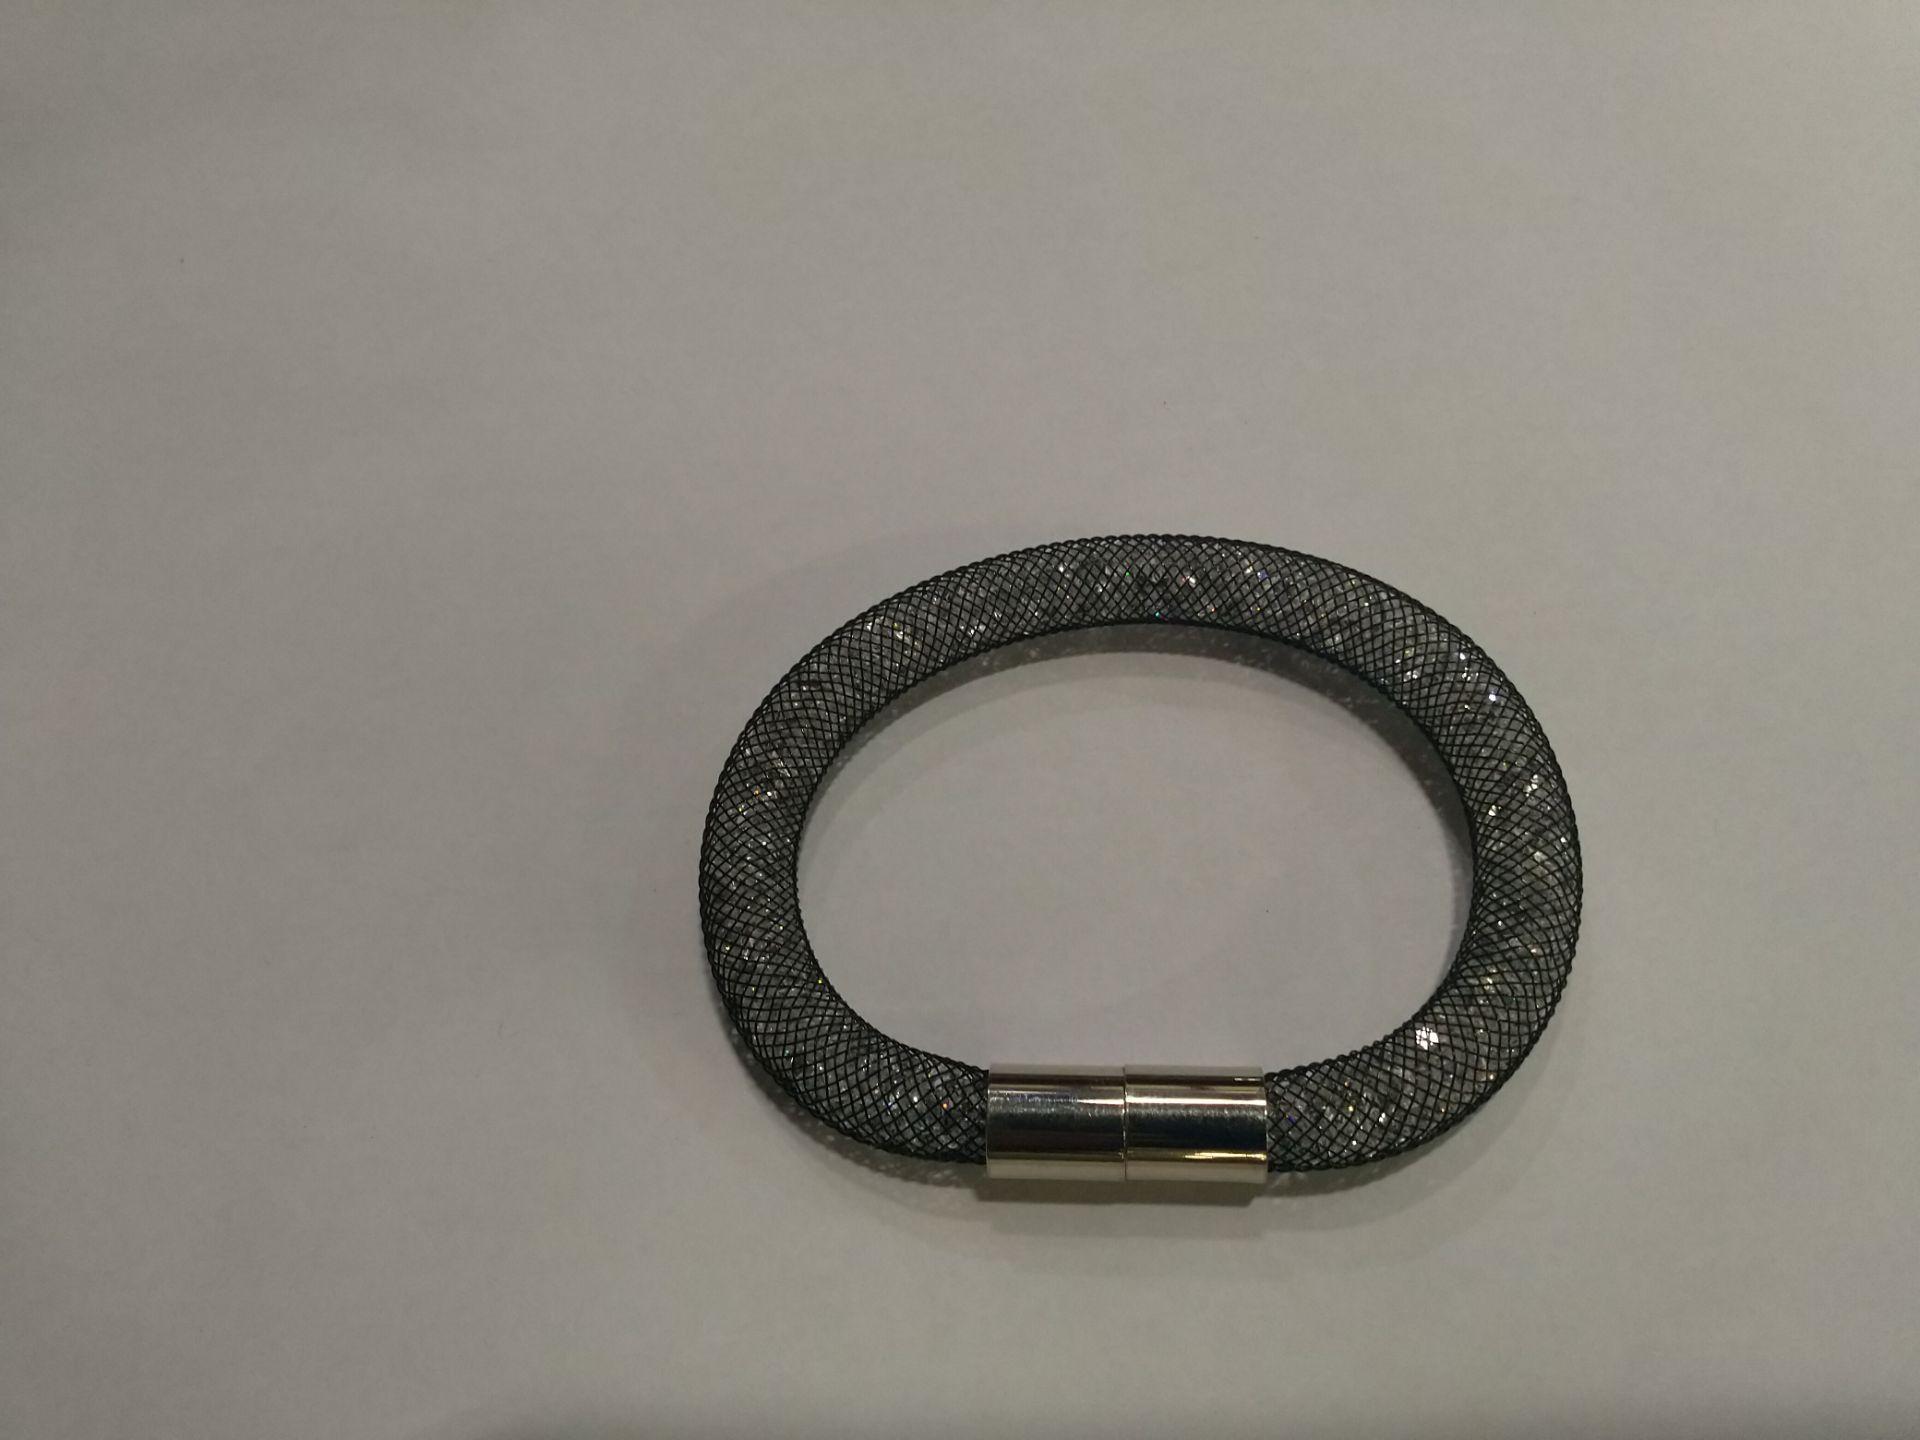 Lot 19 - 35 LE Fiorelli Mesh Bracelet RRP £525